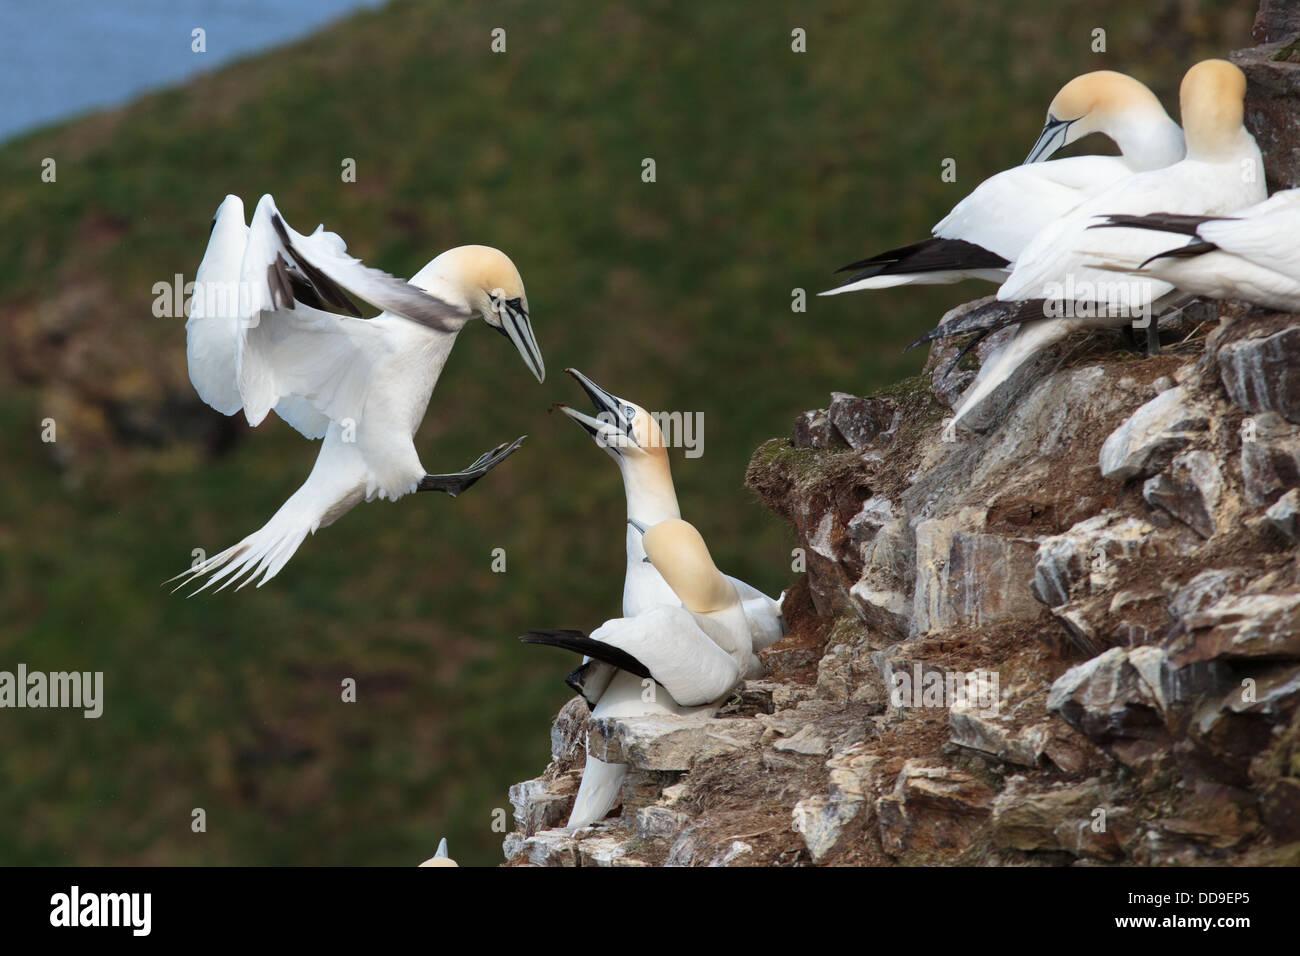 Northern Gannet, Morus bassanus, returning to breeding colony - Stock Image